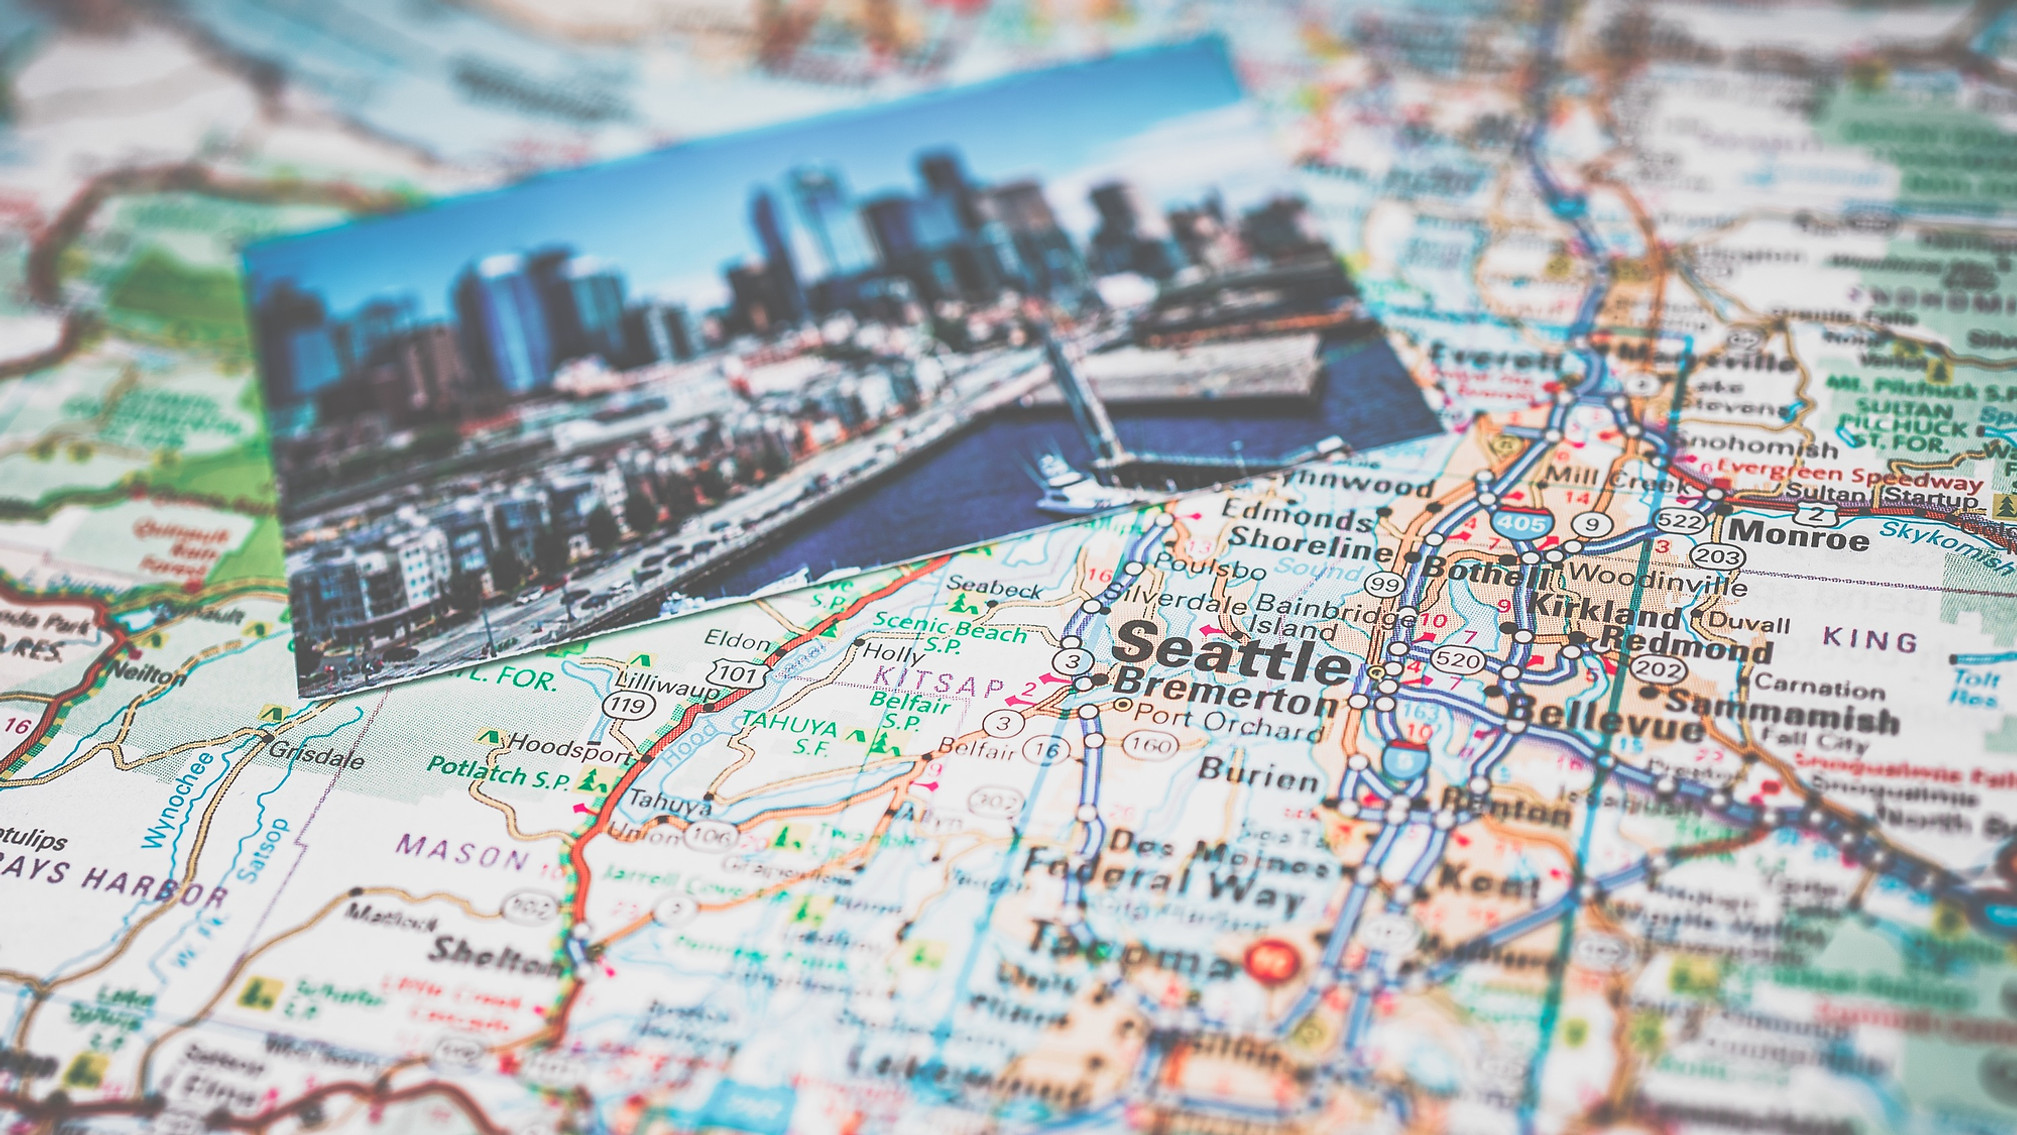 Seattle USA travel map background_edited.jpg